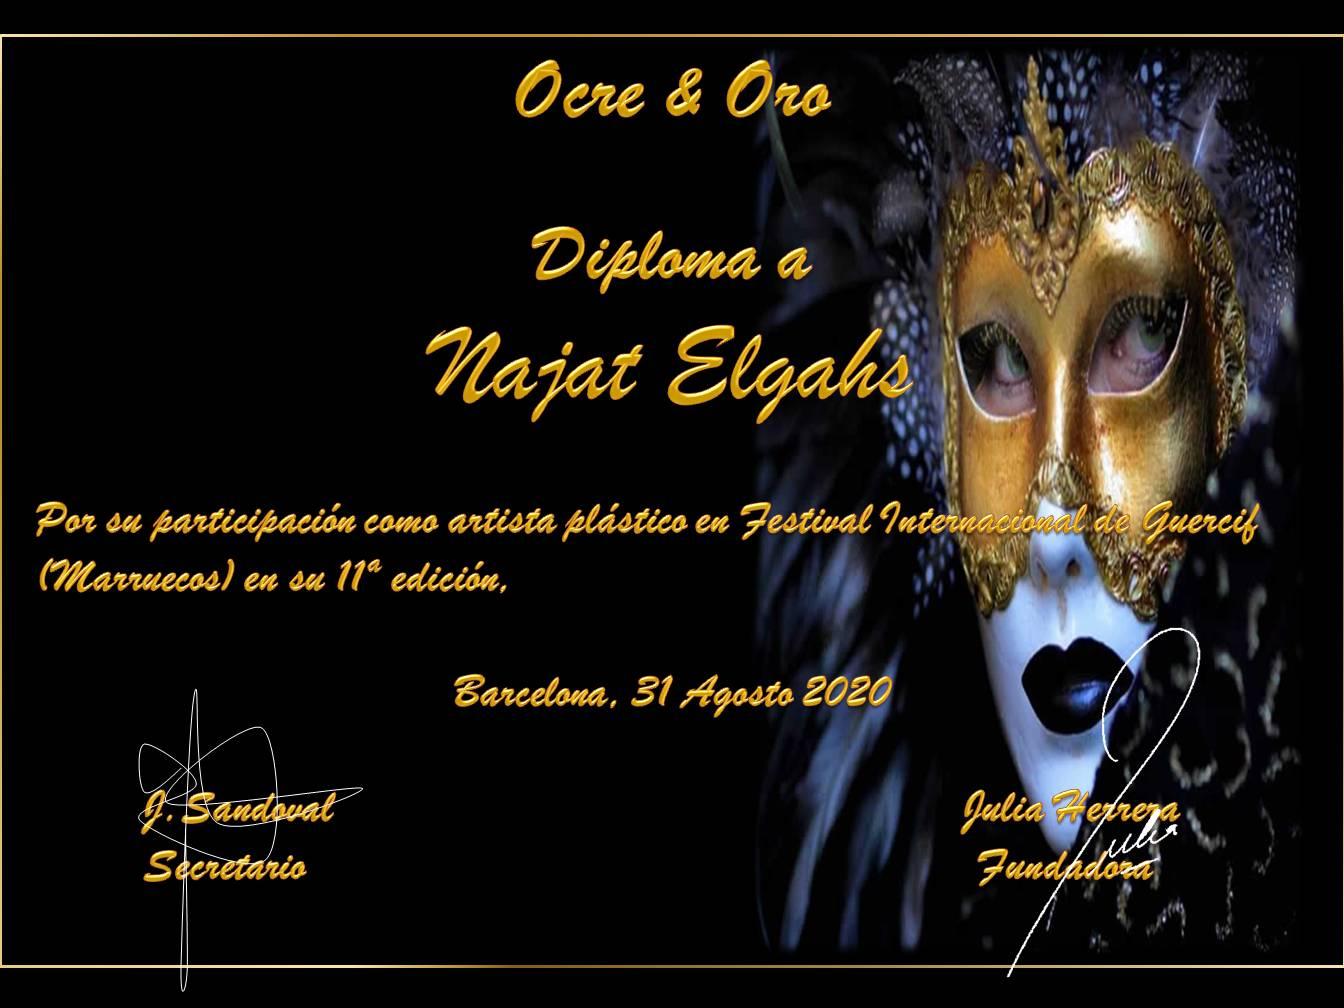 Najat Elgahs